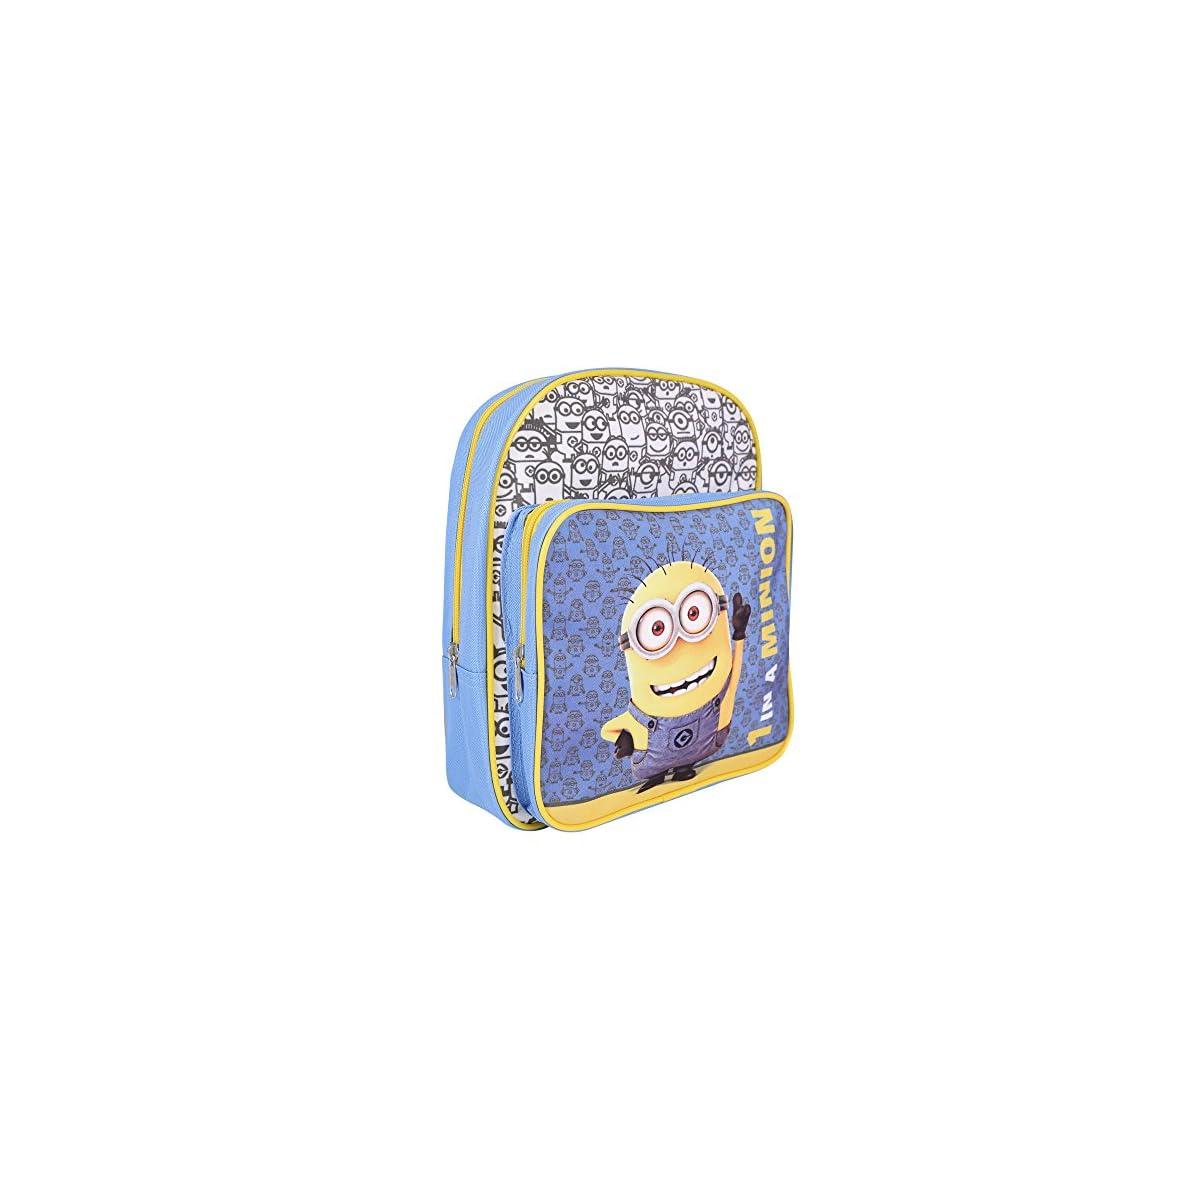 61jMU 7z06L. SS1200  - PERLETTI - Mochila de Niño Niña de Mi Villano Favorito Azul Amarillo - Bolso Escolar con Bolsillo Frontal Estampado Bob de Los Minions - Bolsa Escuela Viaje con Tirantes Regulables - 30x24x6,5 cm